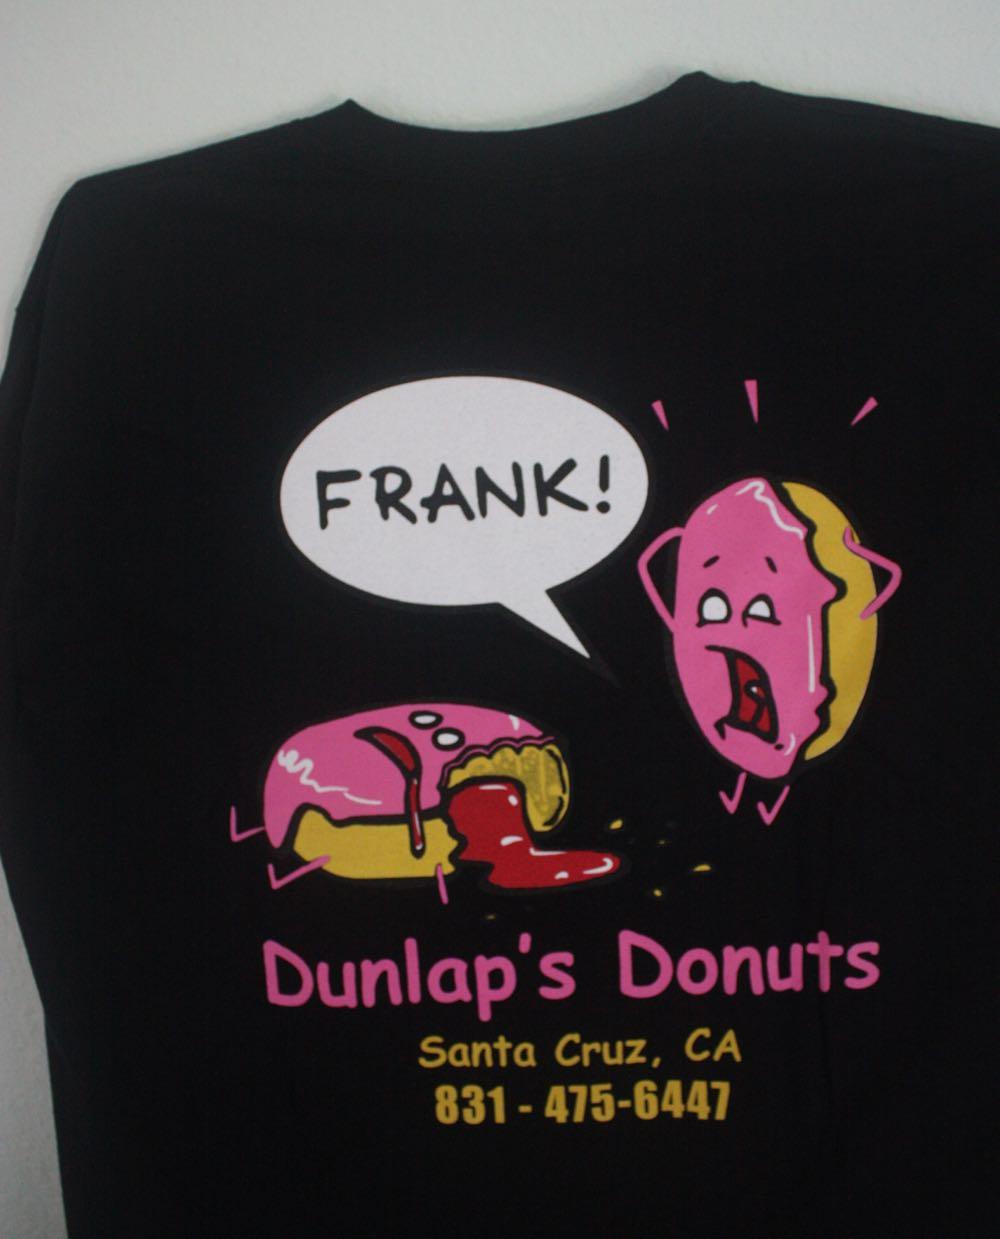 Dunlap's Donuts Santa Cruz Tee 1